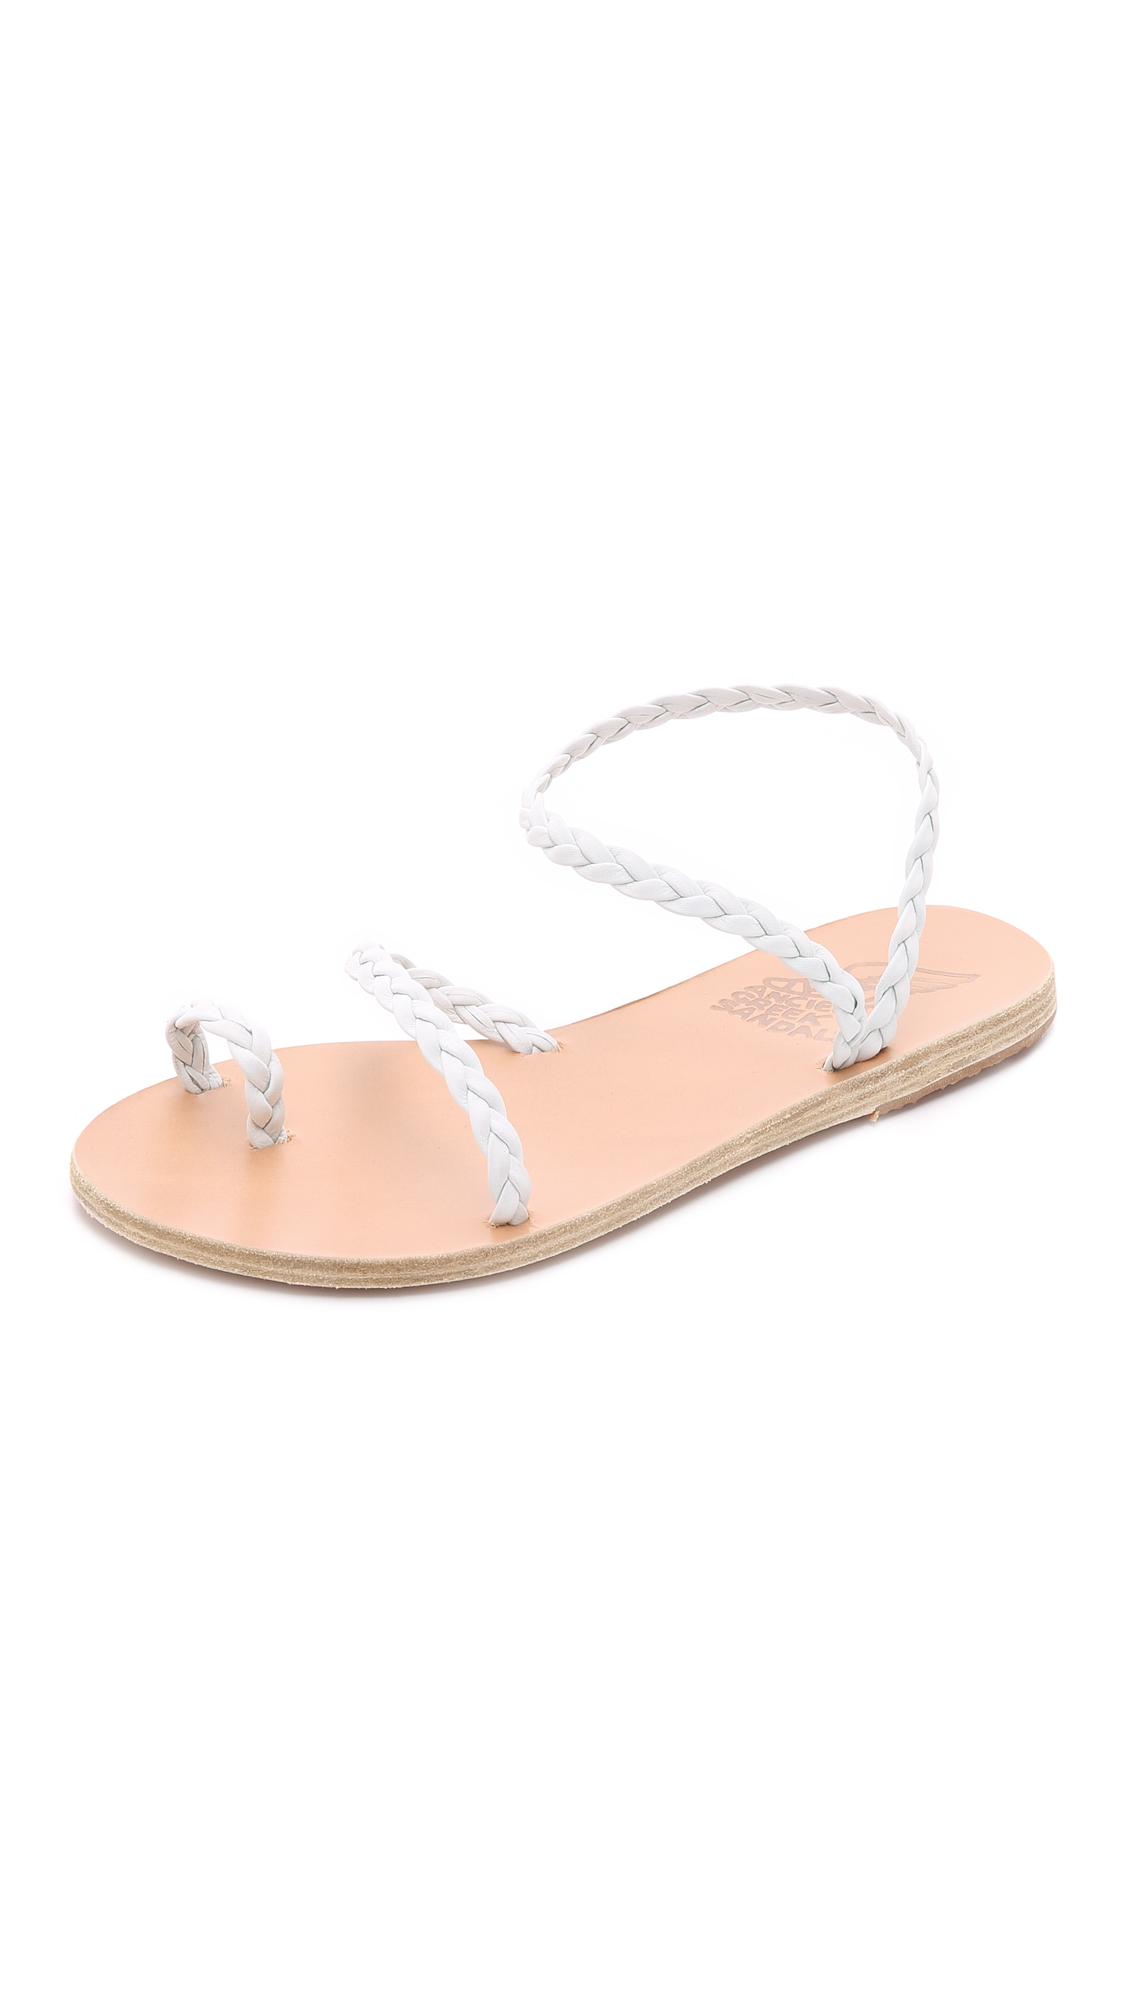 Ancient Greek Sandals Eleftheria Sandals - White at Shopbop